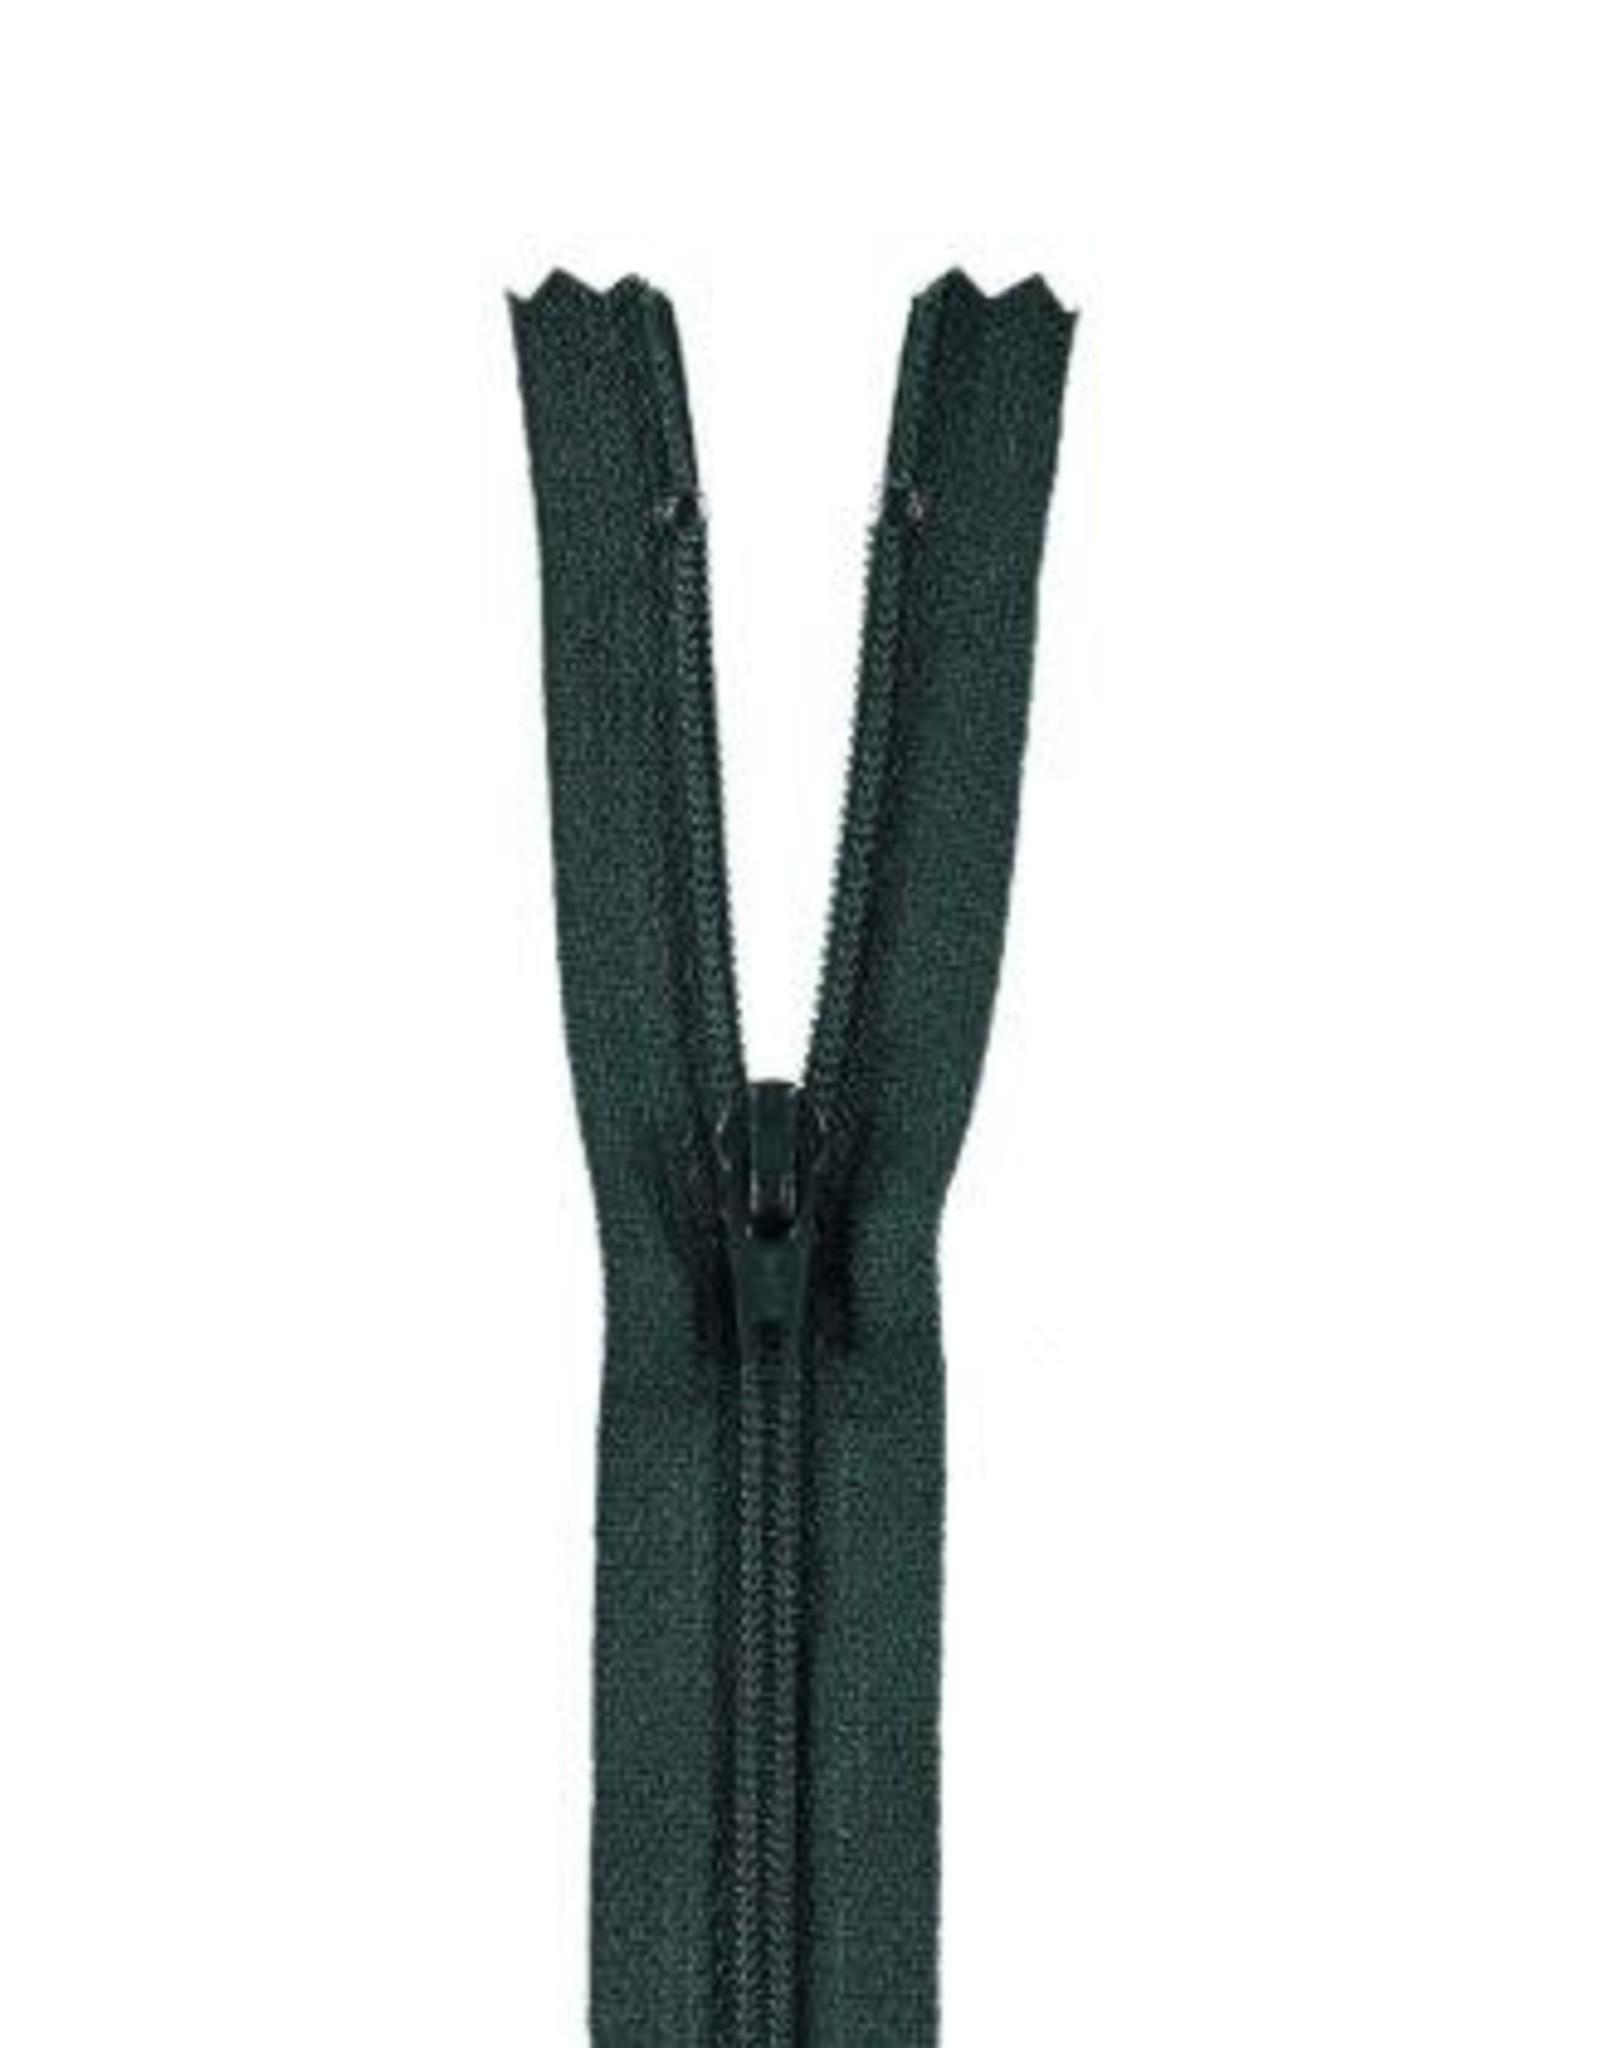 YKK Spiraalrits niet-DB 3mm donker groen 890-50cm